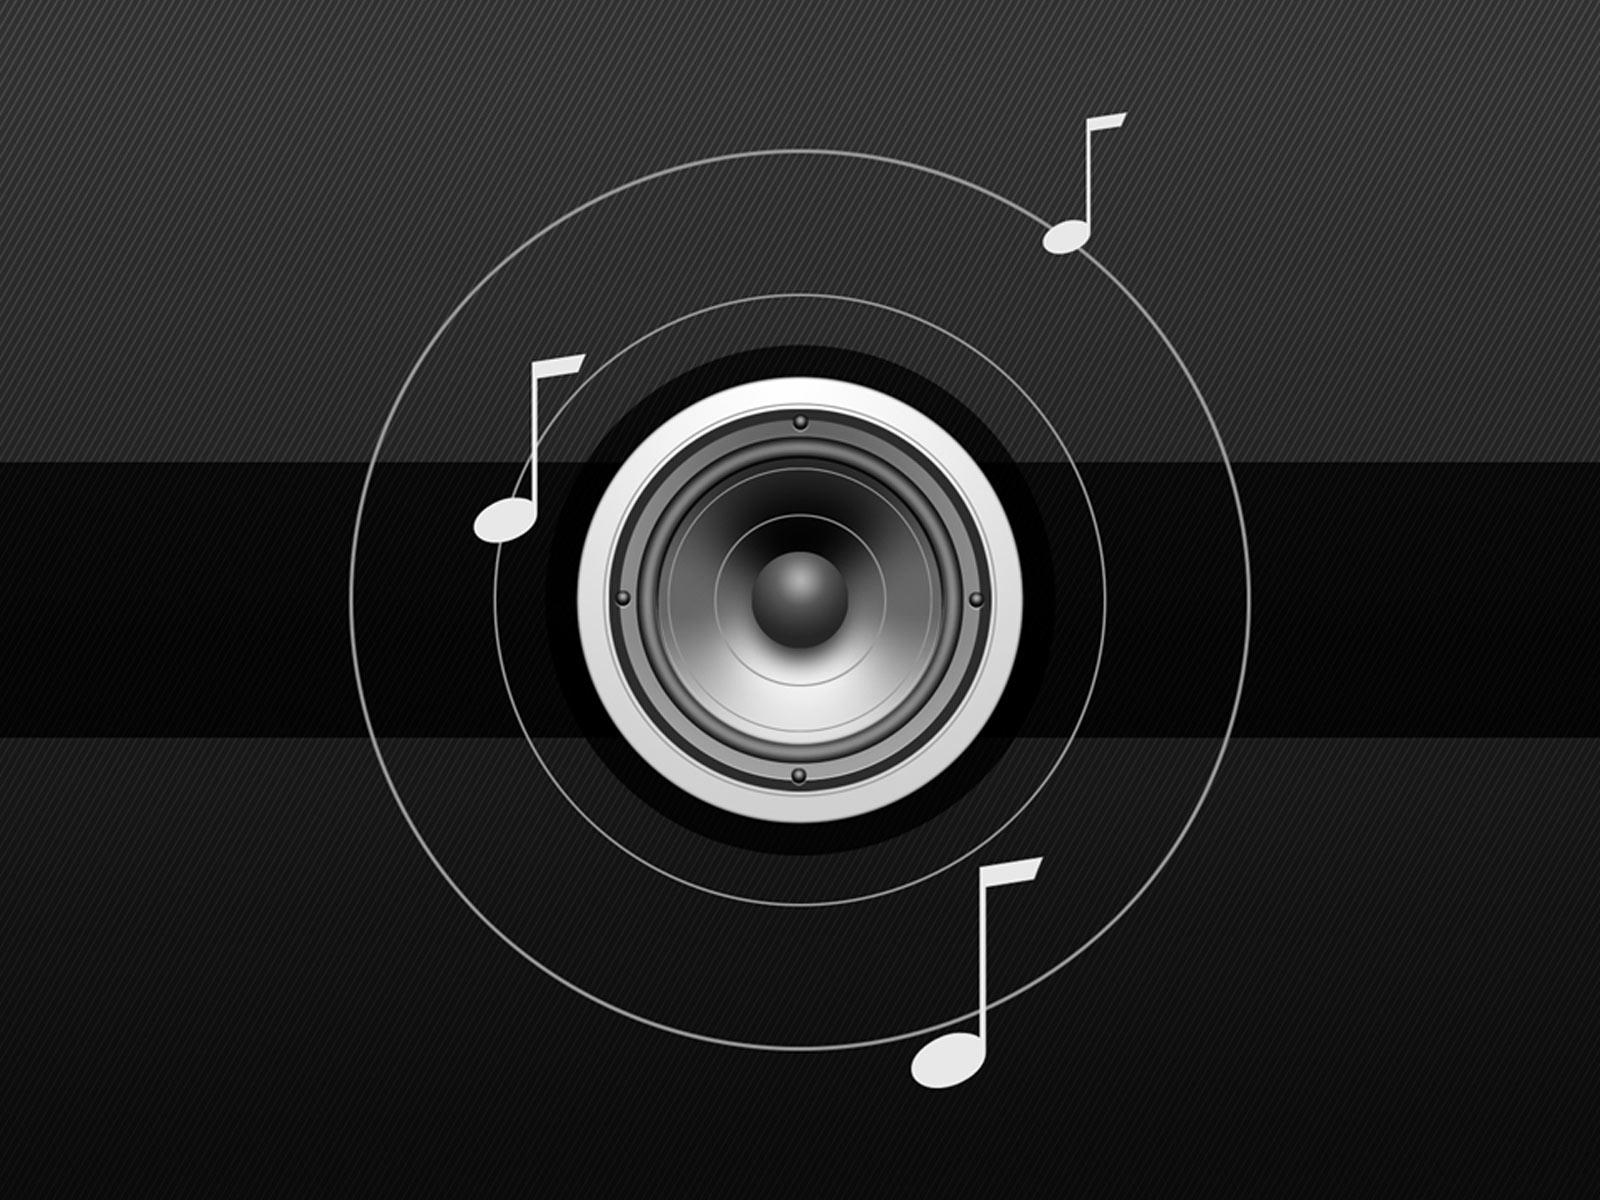 Desktop Wallpaper Gallery 3D Art Sound Background 1600x1200